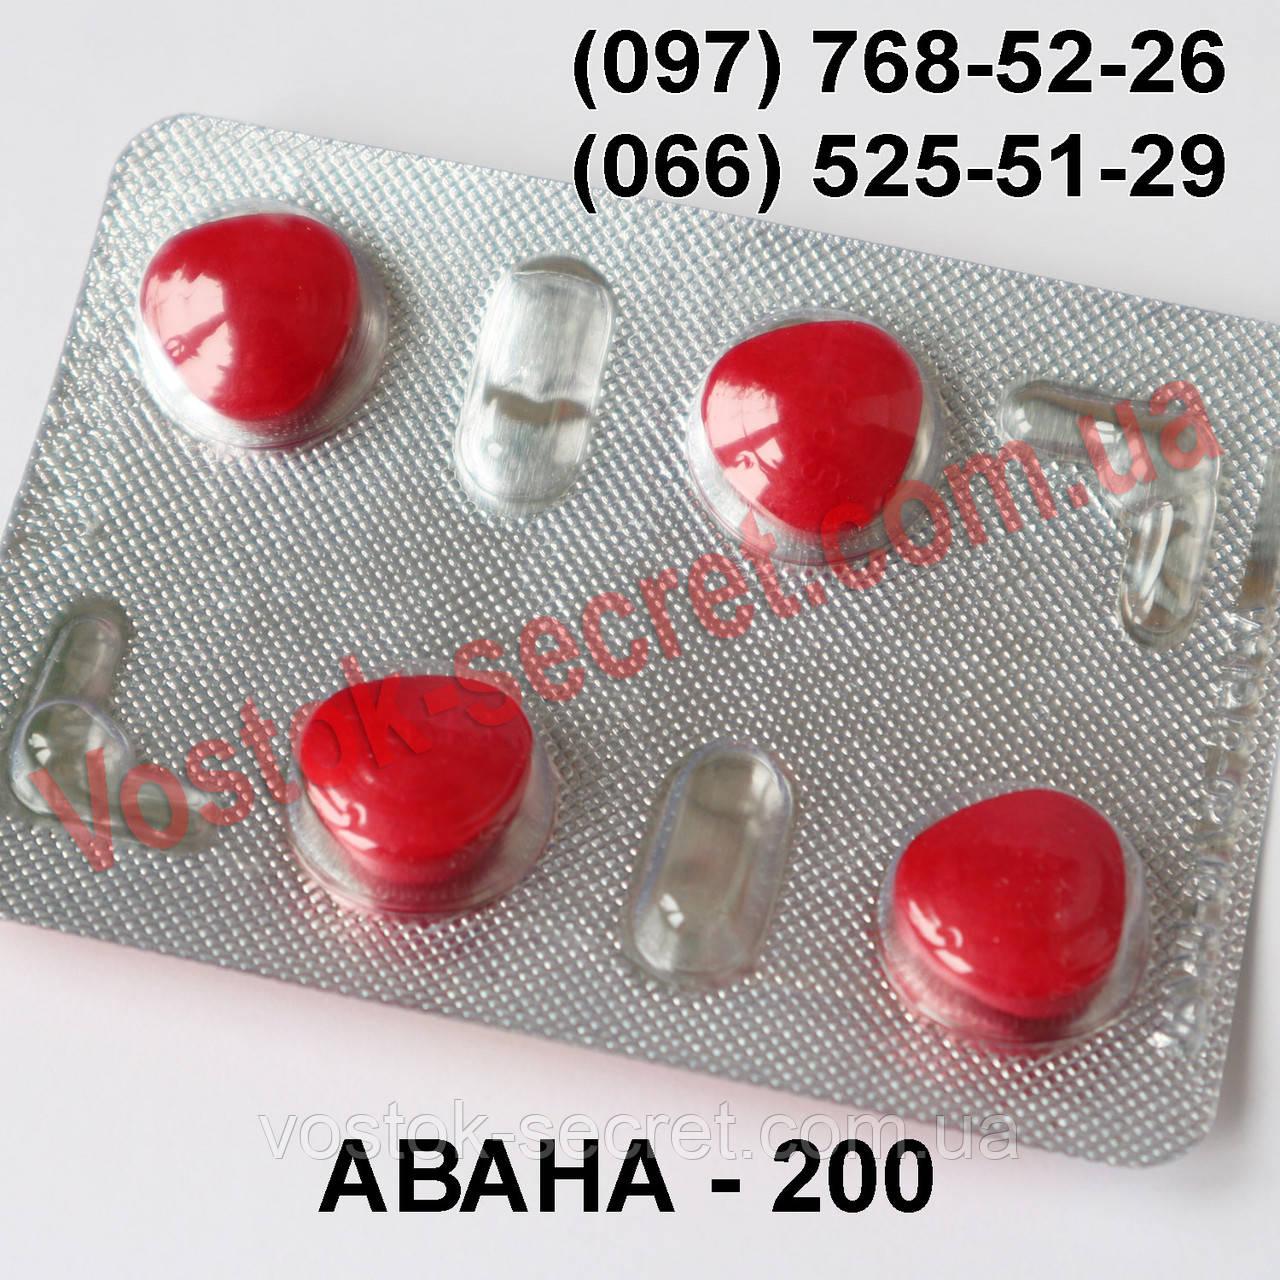 AVANA-200.. препарат для потенции. Пробник, 1 таблетка